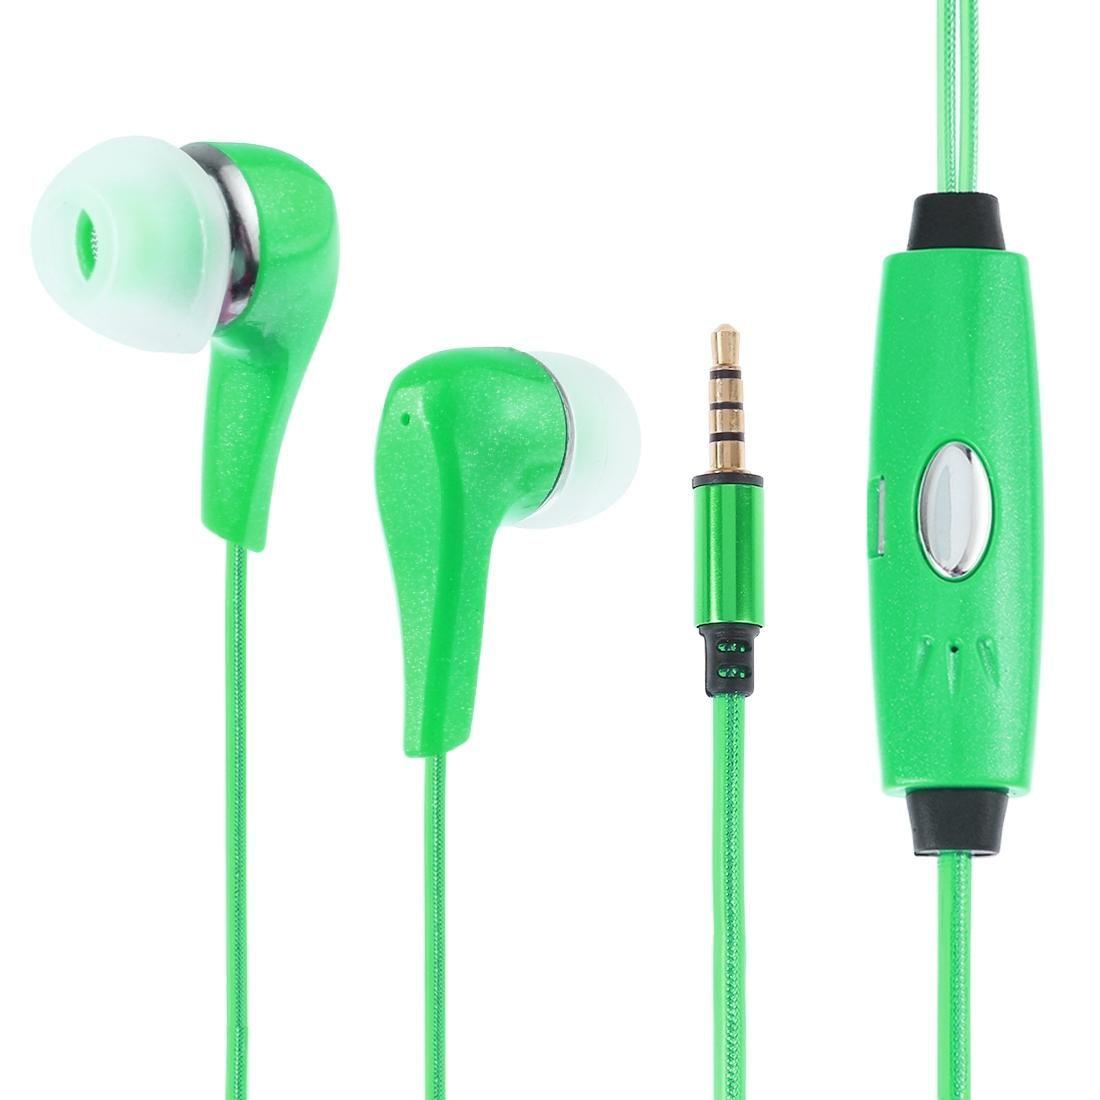 1m plugue de 3,5 mm Universal Stereo Visible EL Fluente Luz fones de ouvido com microfone